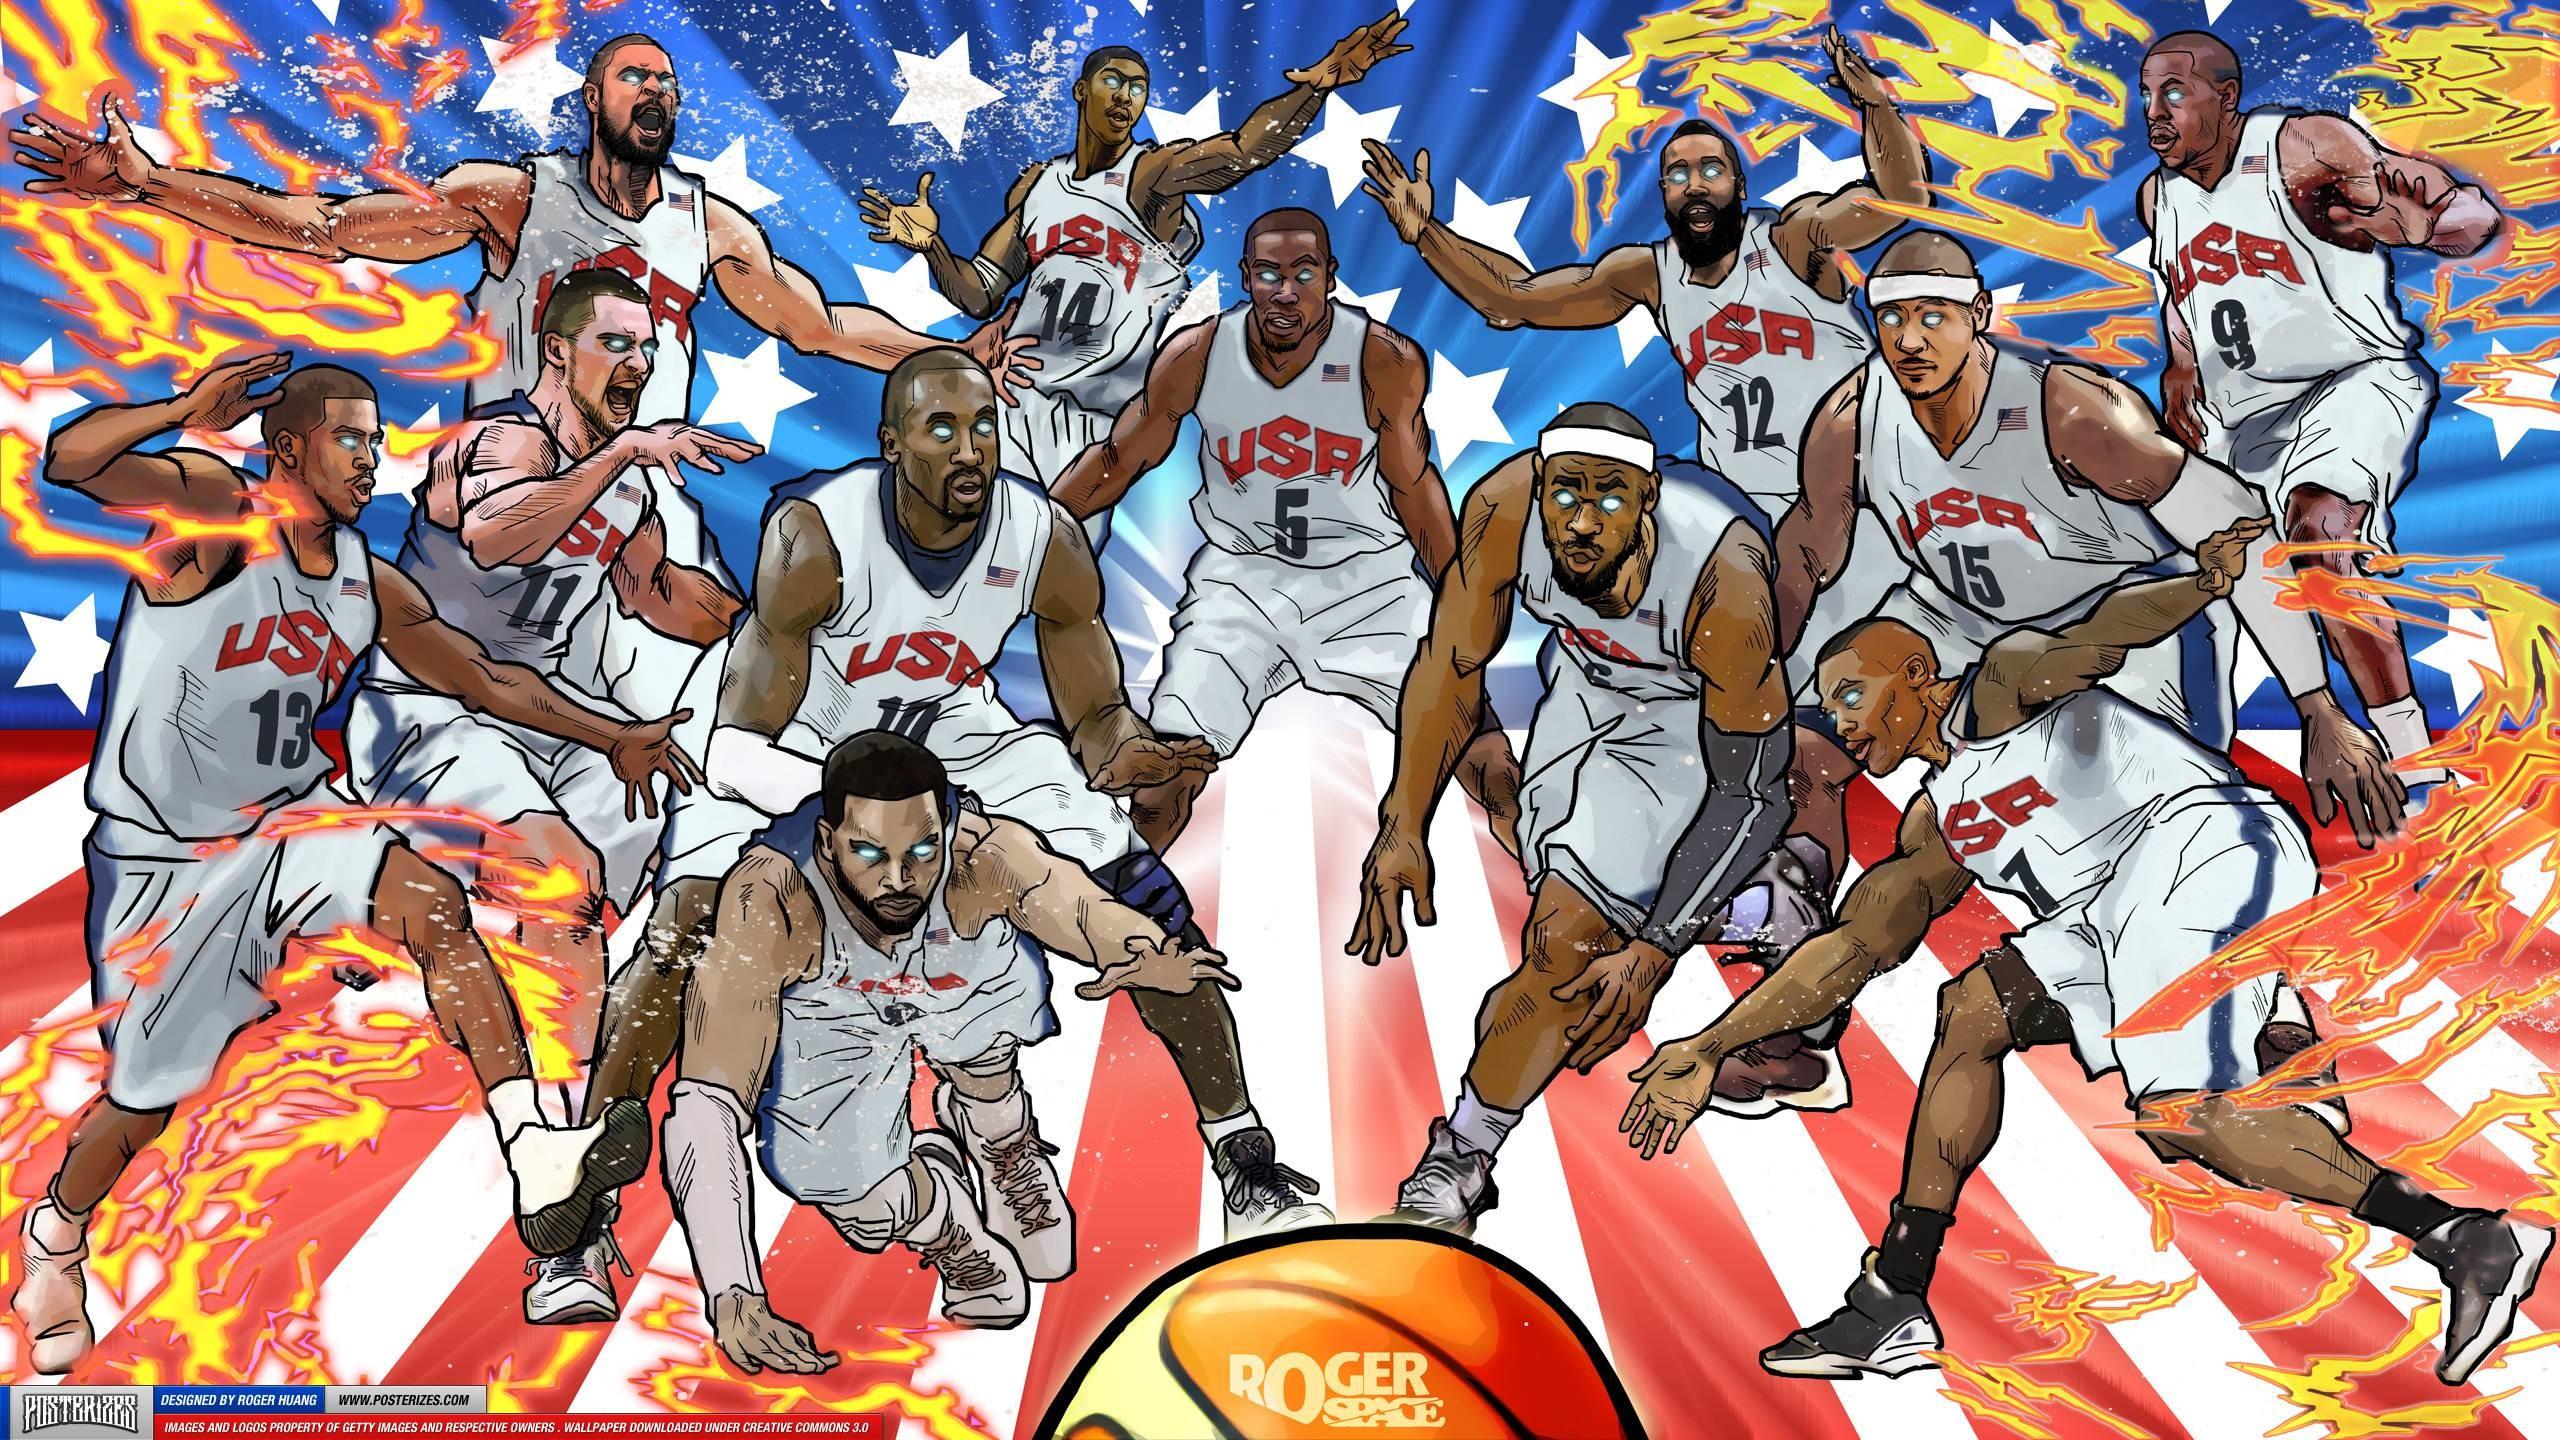 Explore Usa Wallpaper, Cartoon Wallpaper, and more! NBA Wallpapers Wallpaper